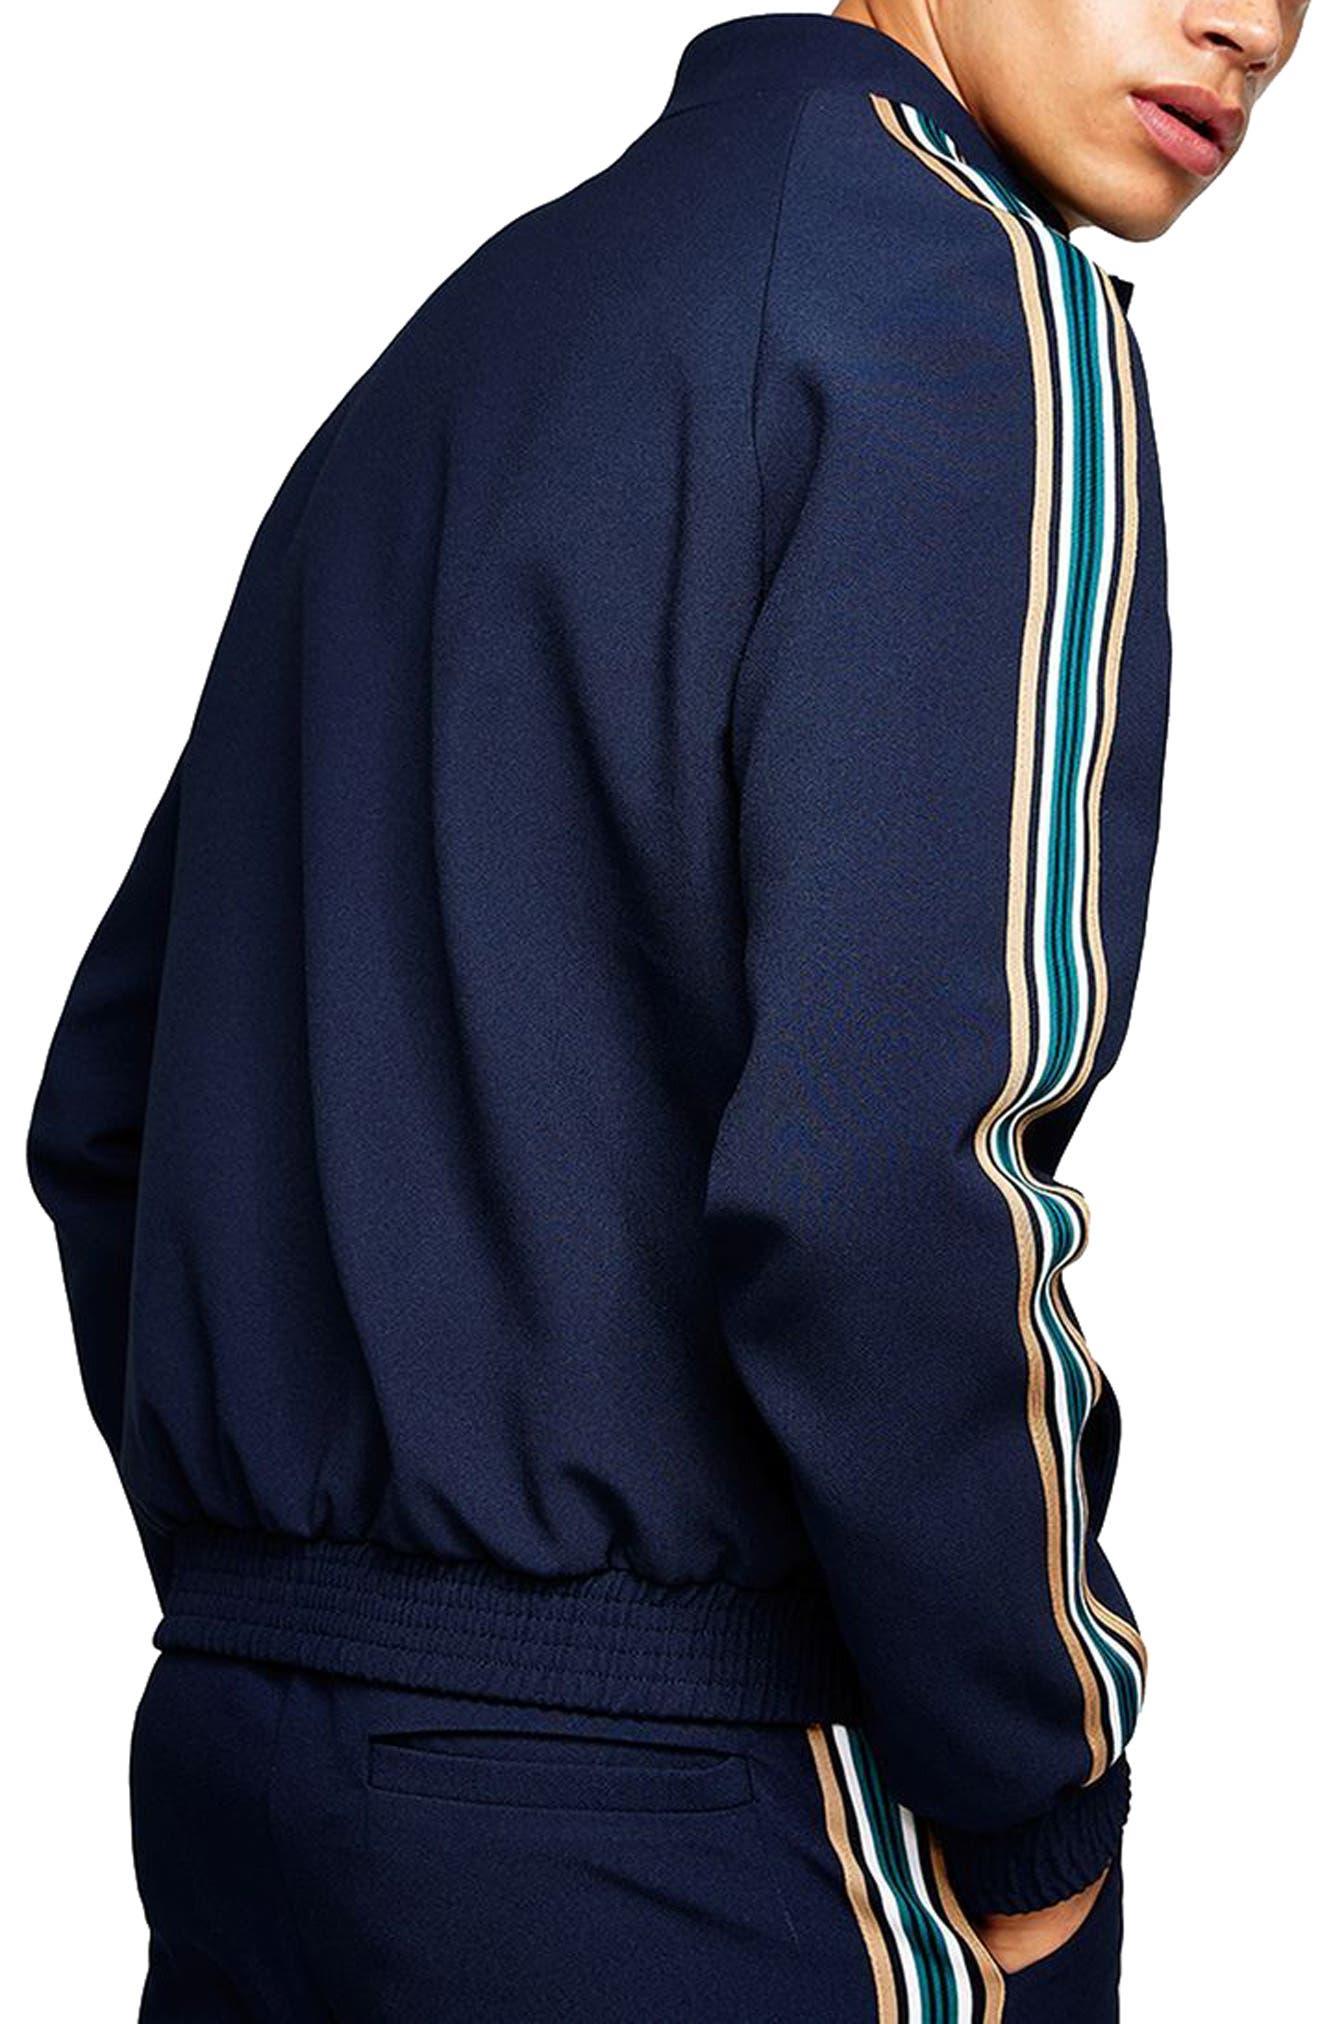 Track Jacket,                             Alternate thumbnail 2, color,                             Dark Blue Multi